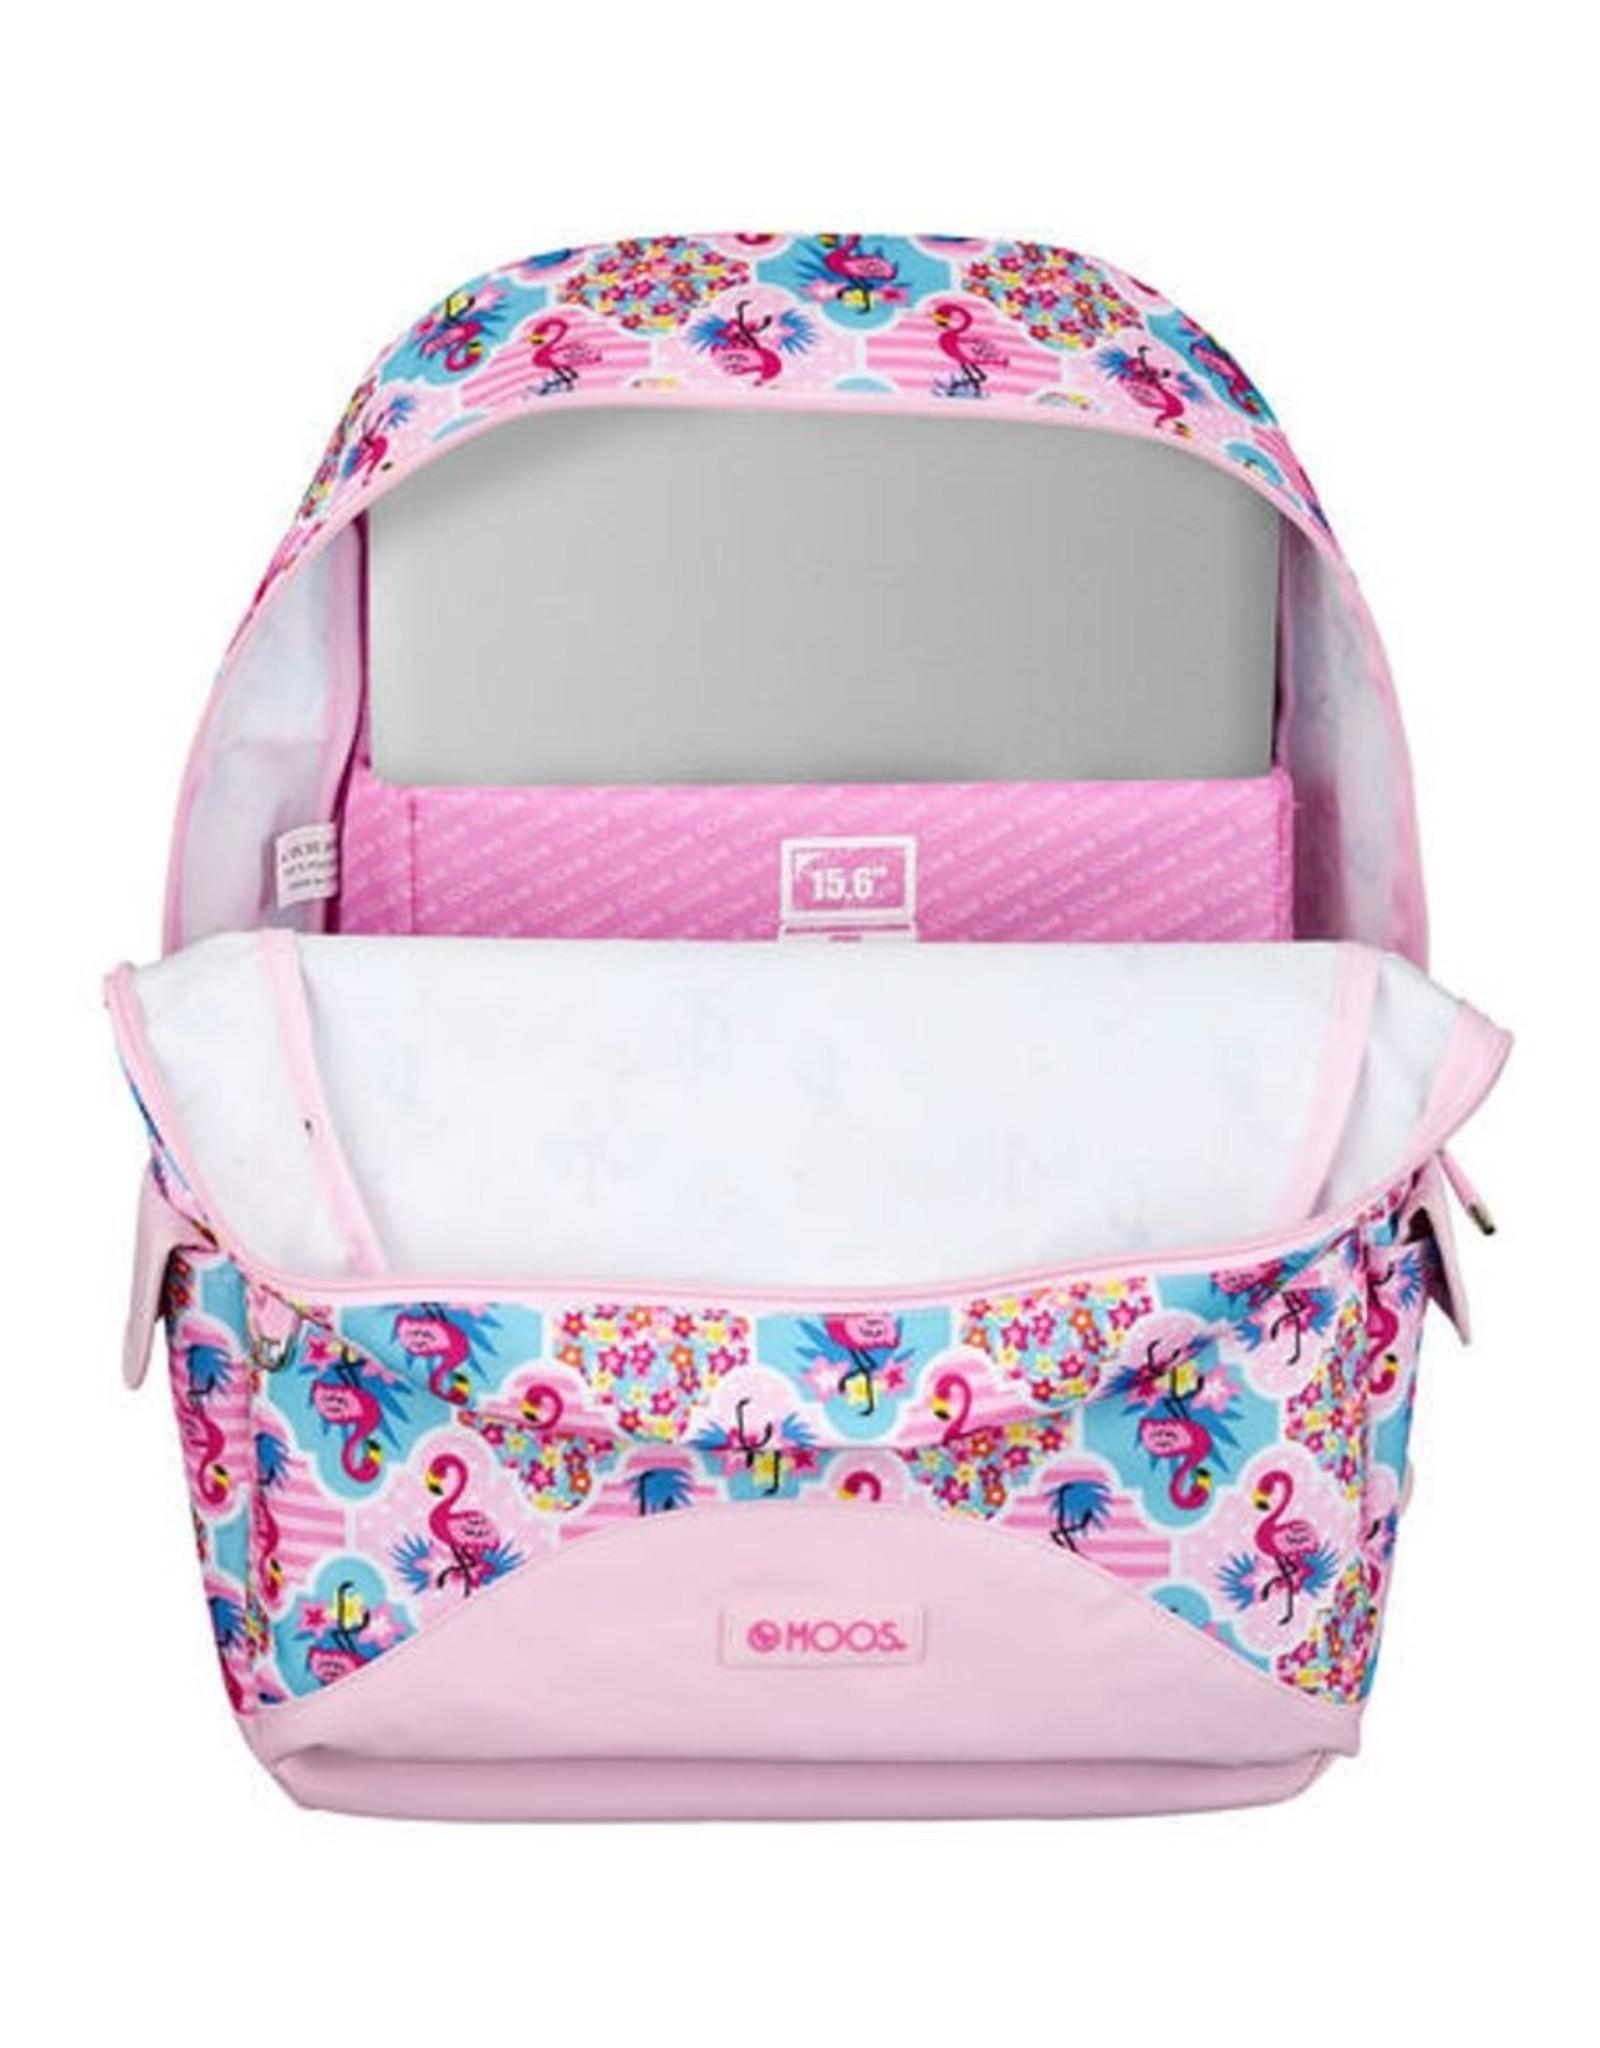 Moos Fantasy tassen - Moos Flamingo Pink Laptop Rugzak